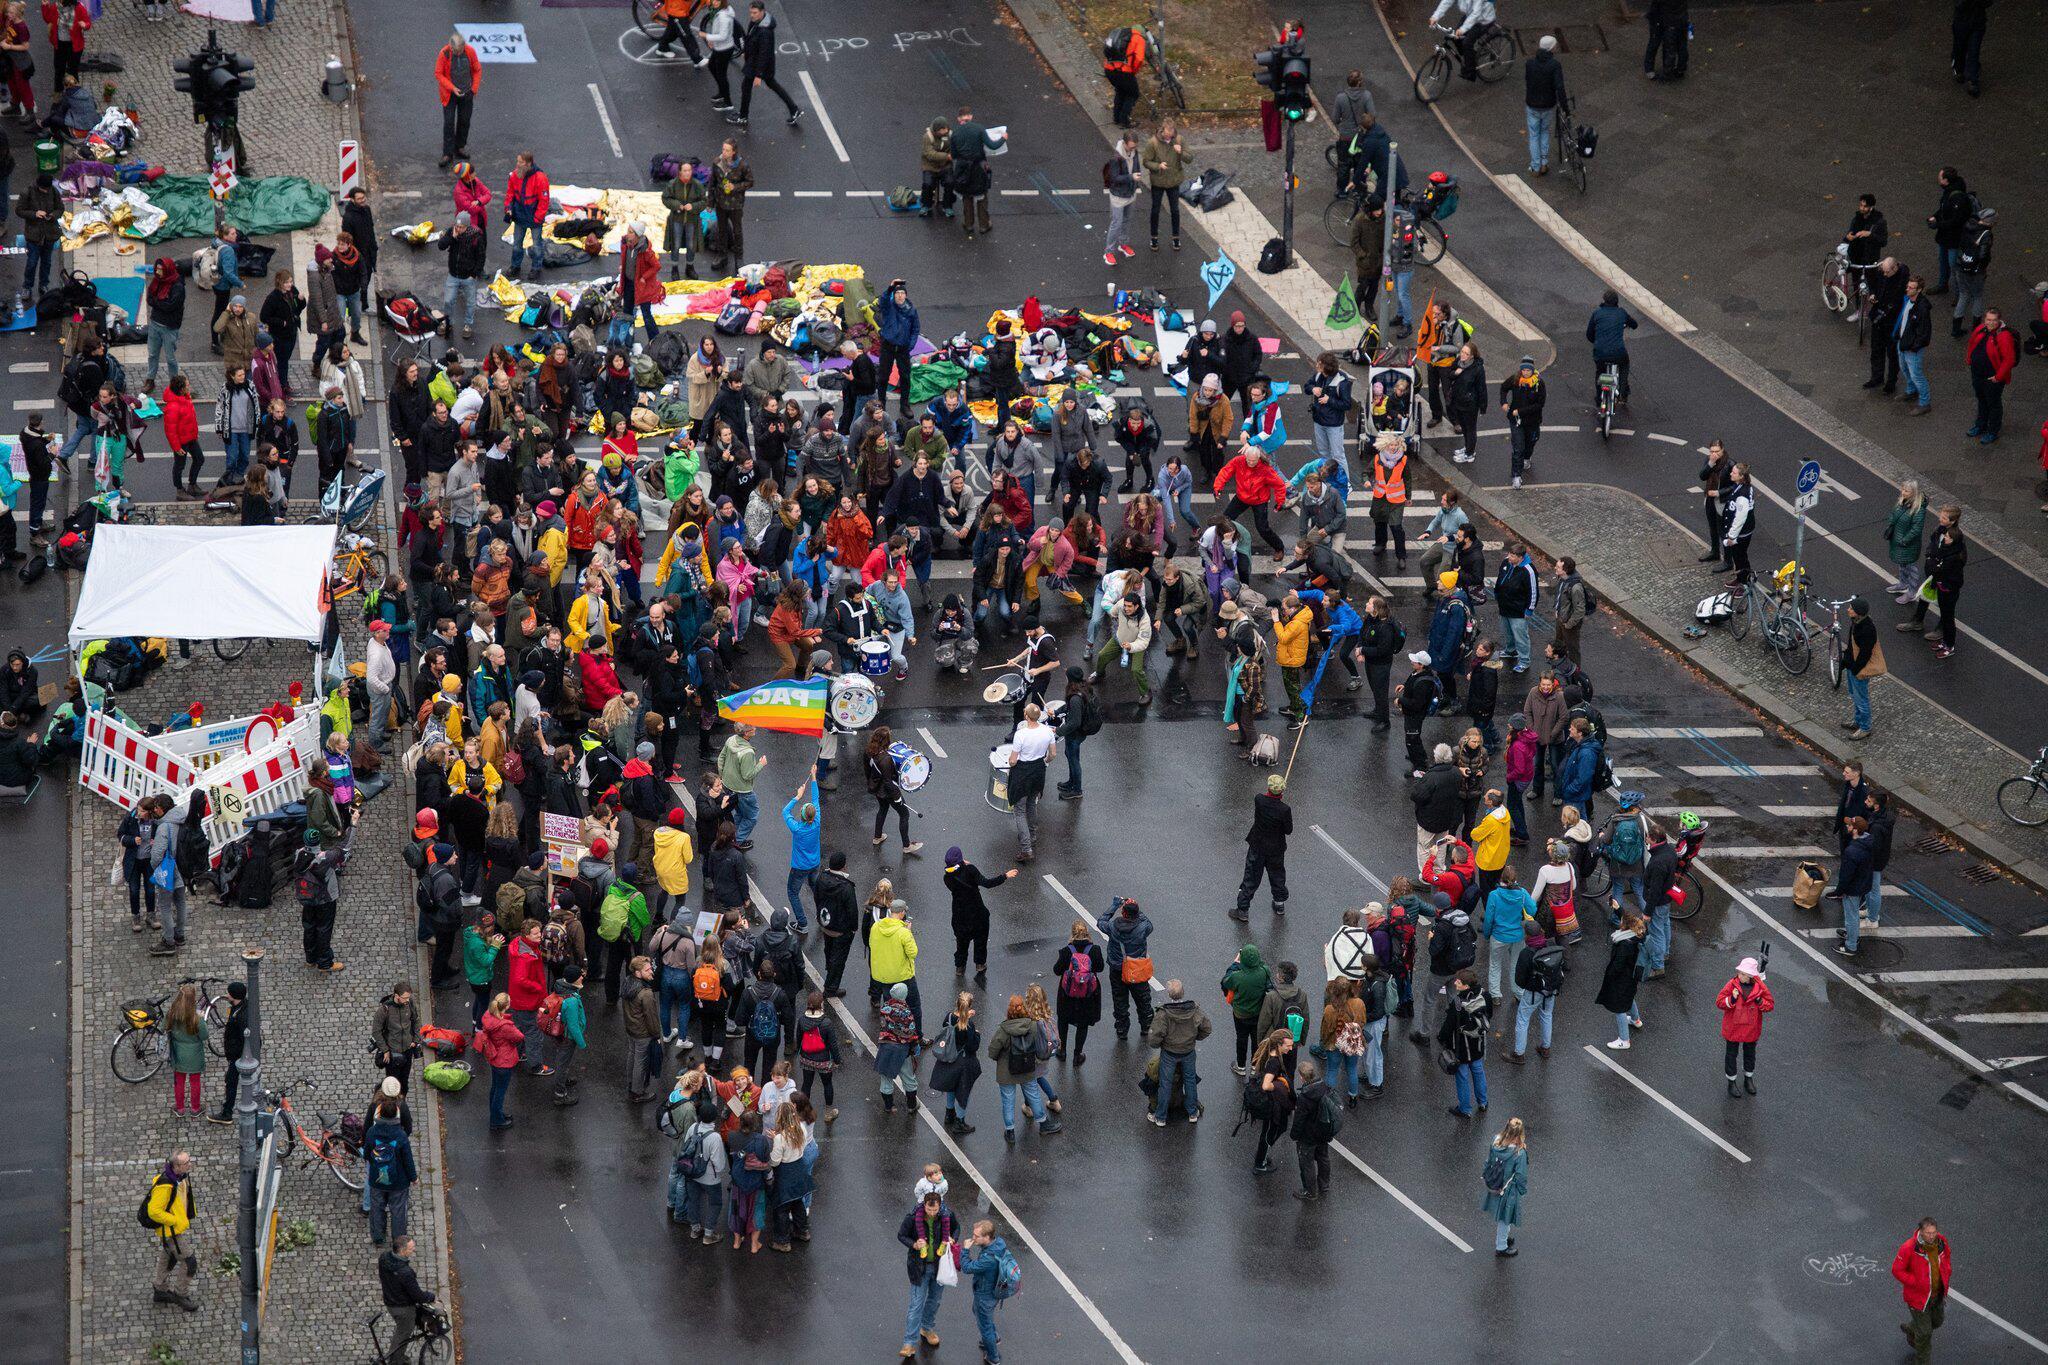 Klima: Boris Johnson kritisiert Klima-Demonstranten